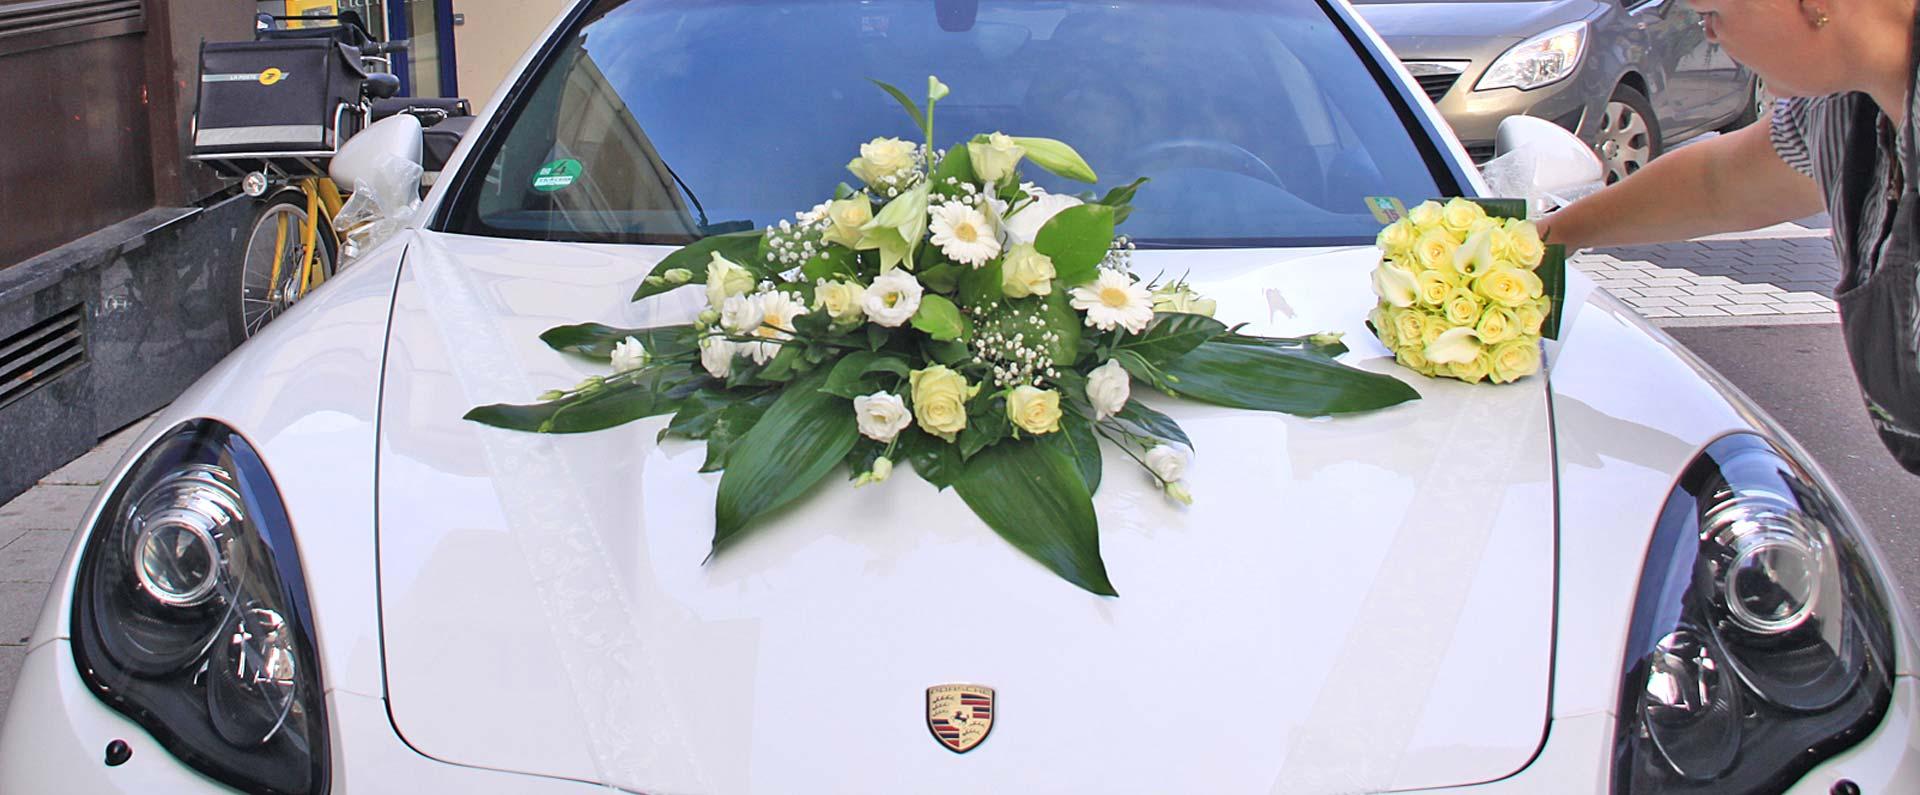 decoration mariage tendance voiture